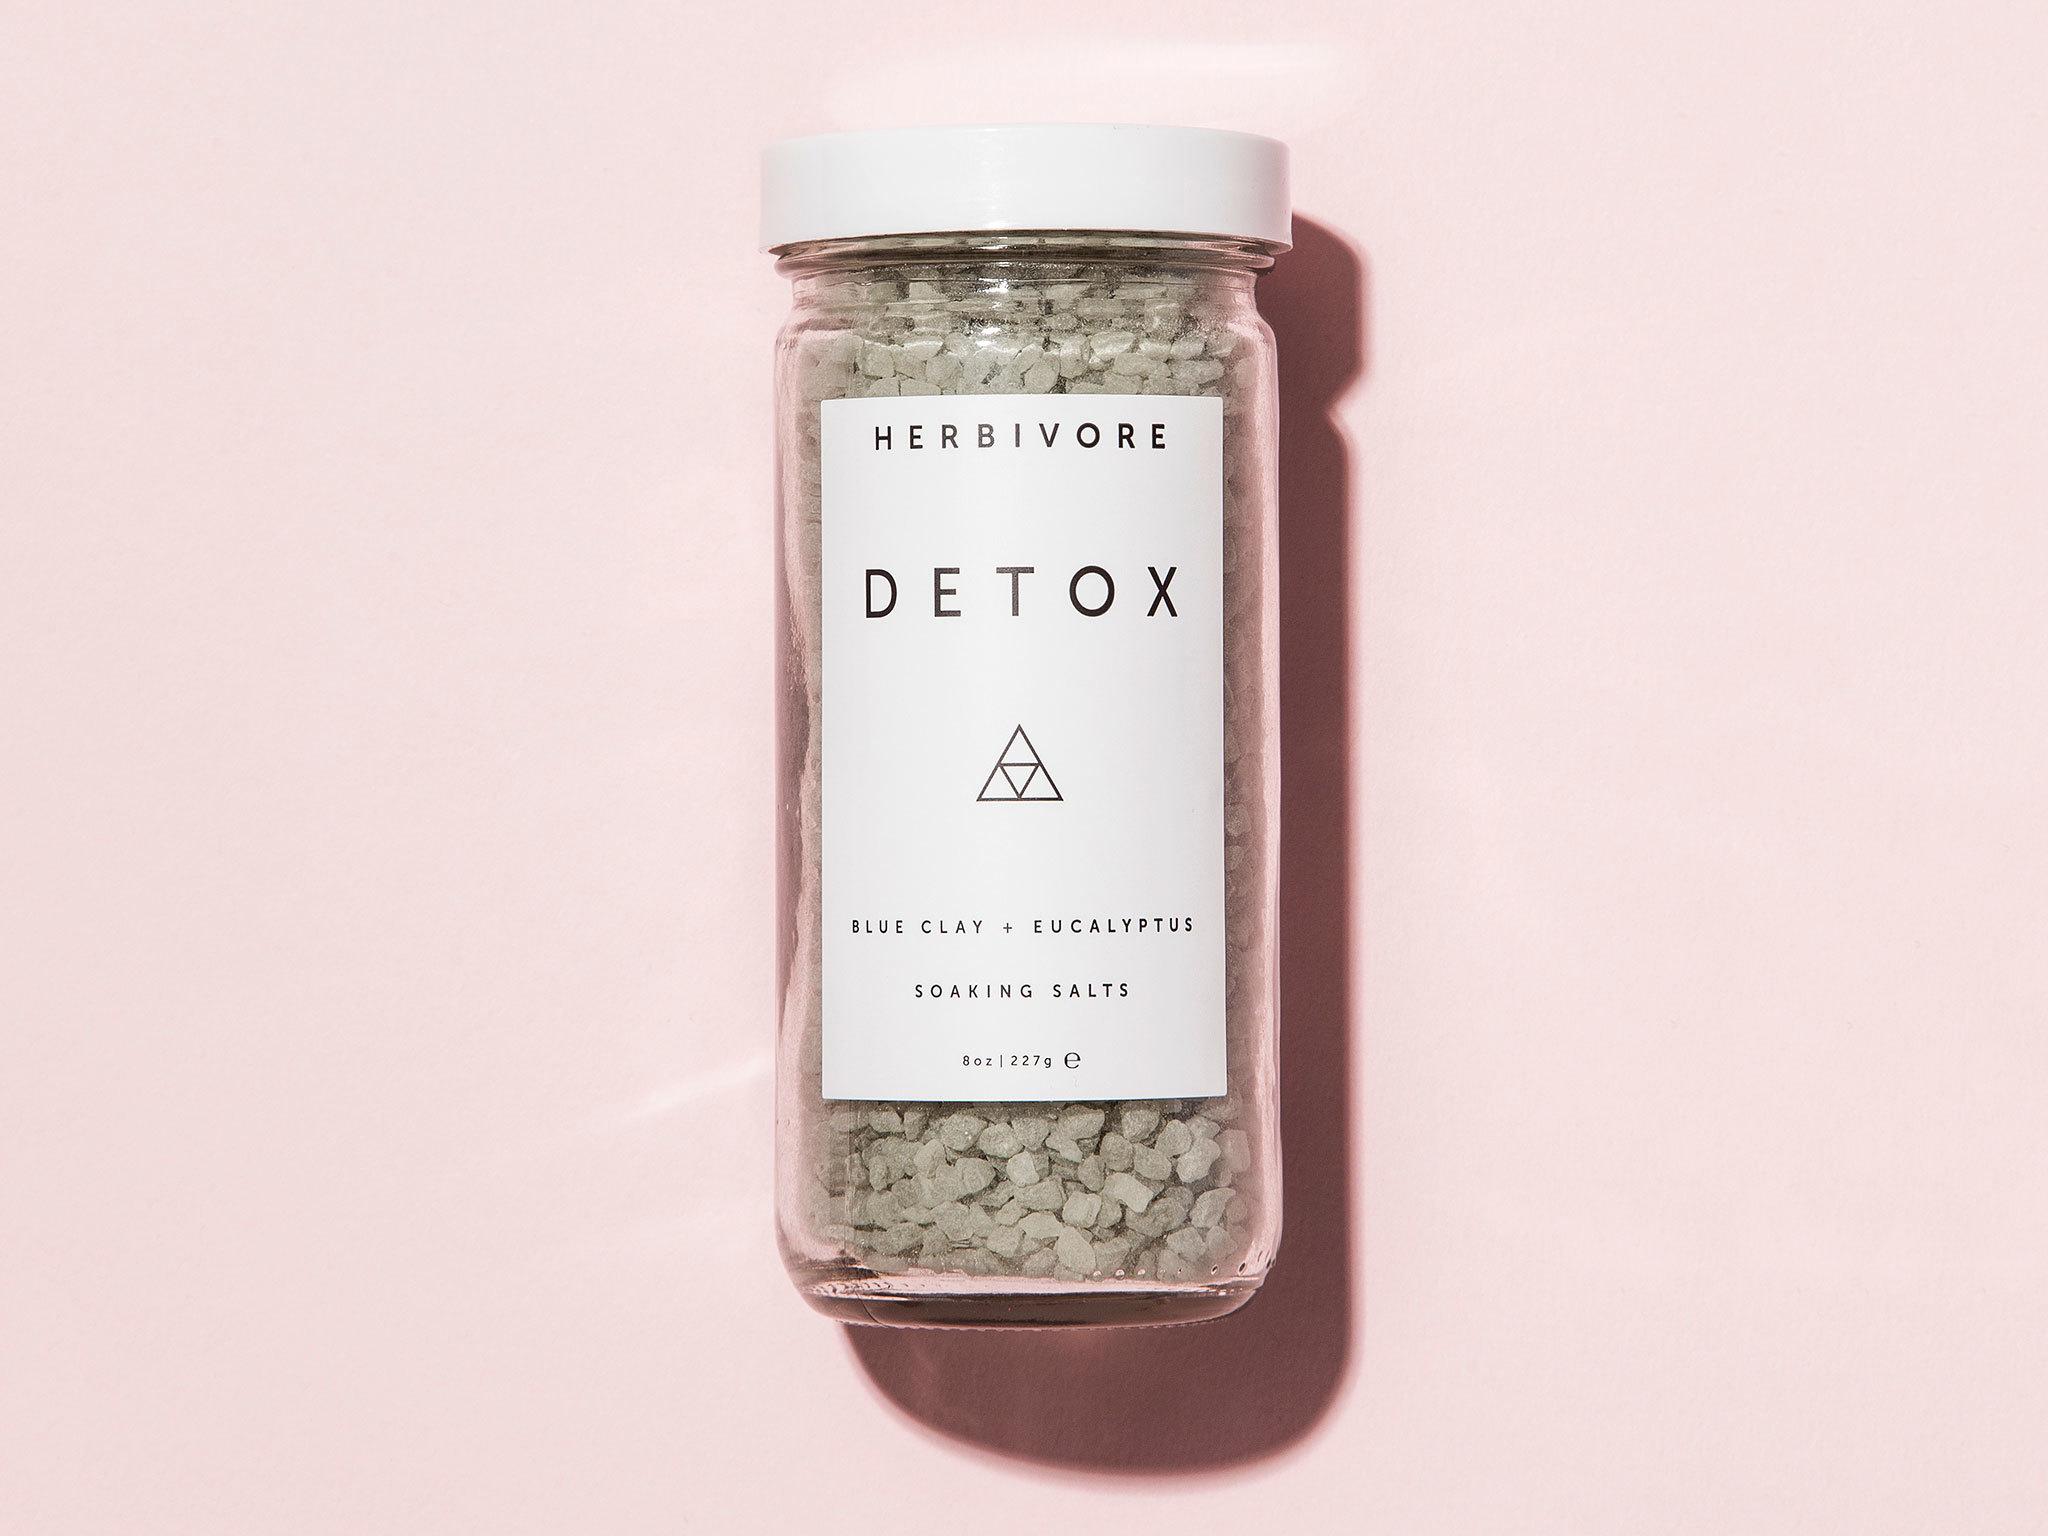 Detox bath salts by Herbivore